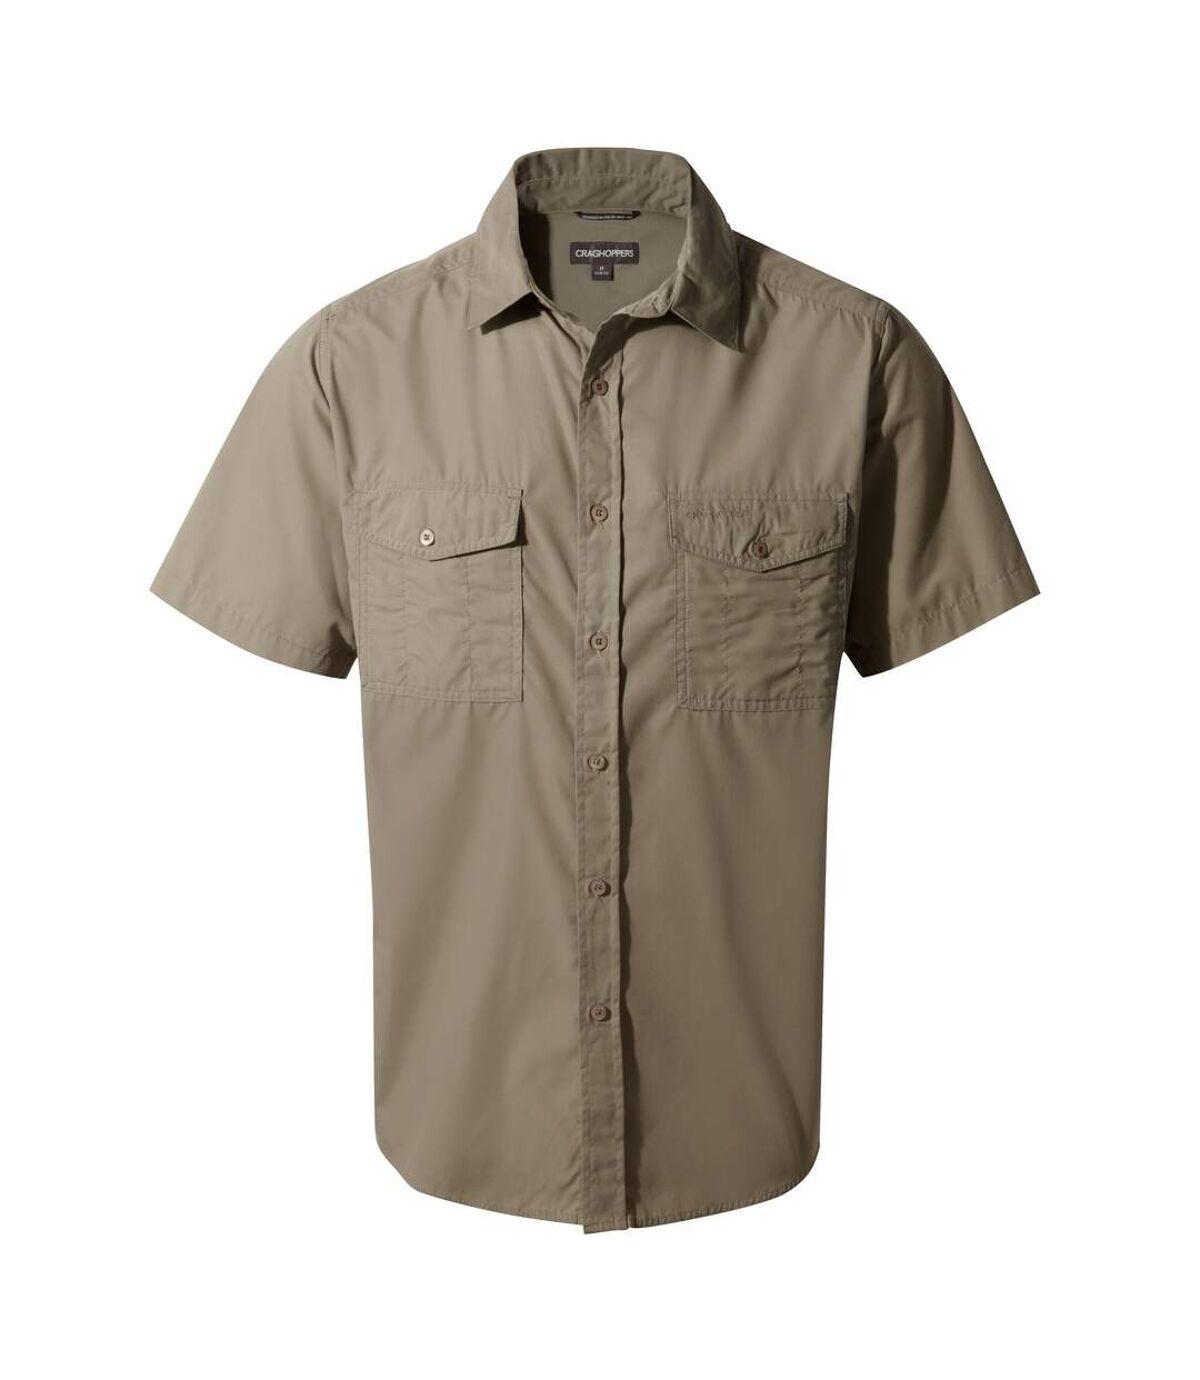 Craghoppers Outdoor Classic Mens Kiwi Short Sleeve Shirt (Cedar) - UTCG181